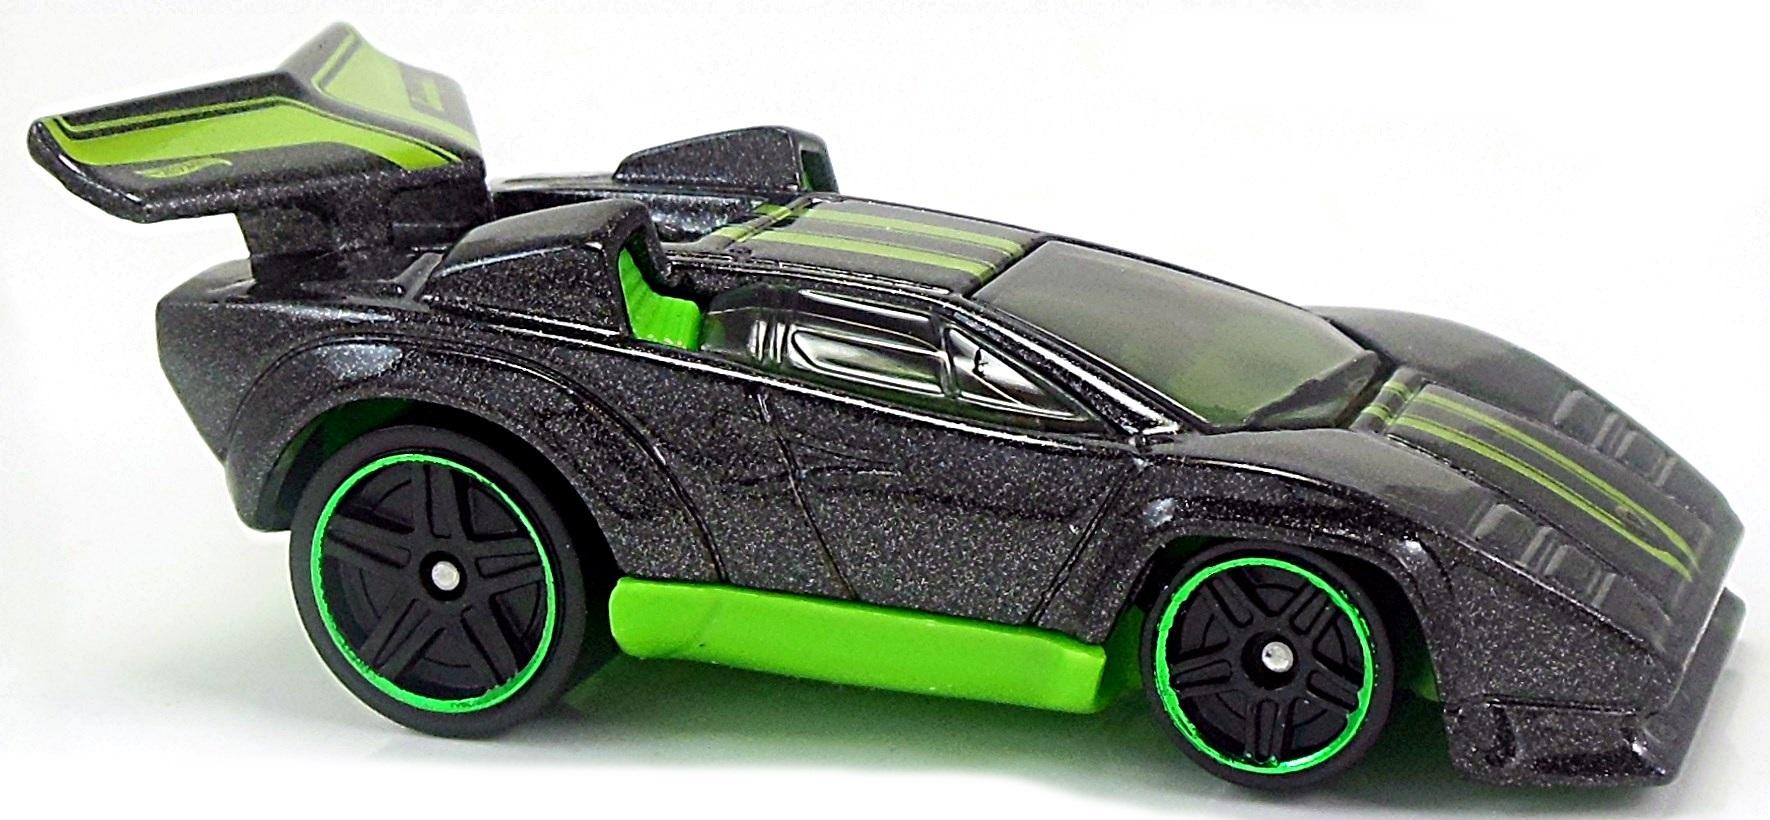 Lamborghini Countach Tooned 74mm 2004 Hot Wheels